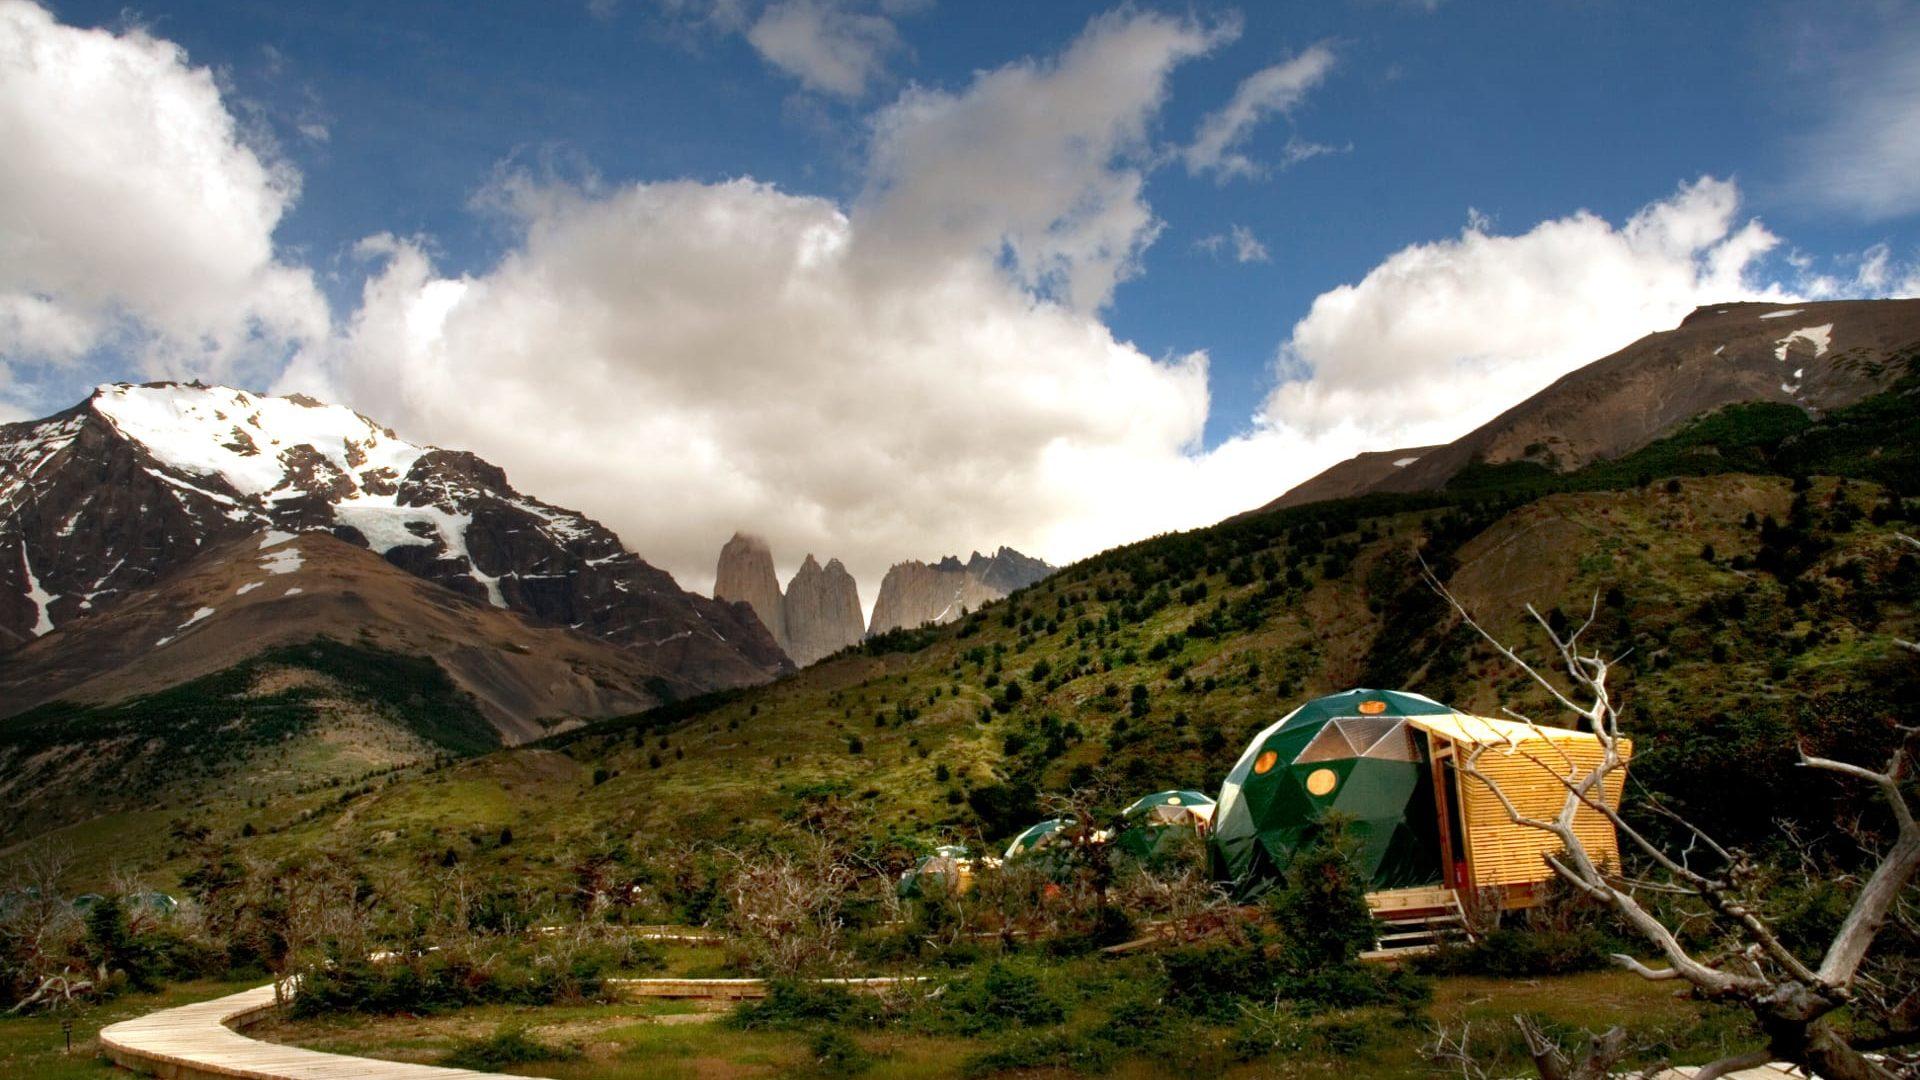 Chili EcoCamp patagonia uitzicht buiten